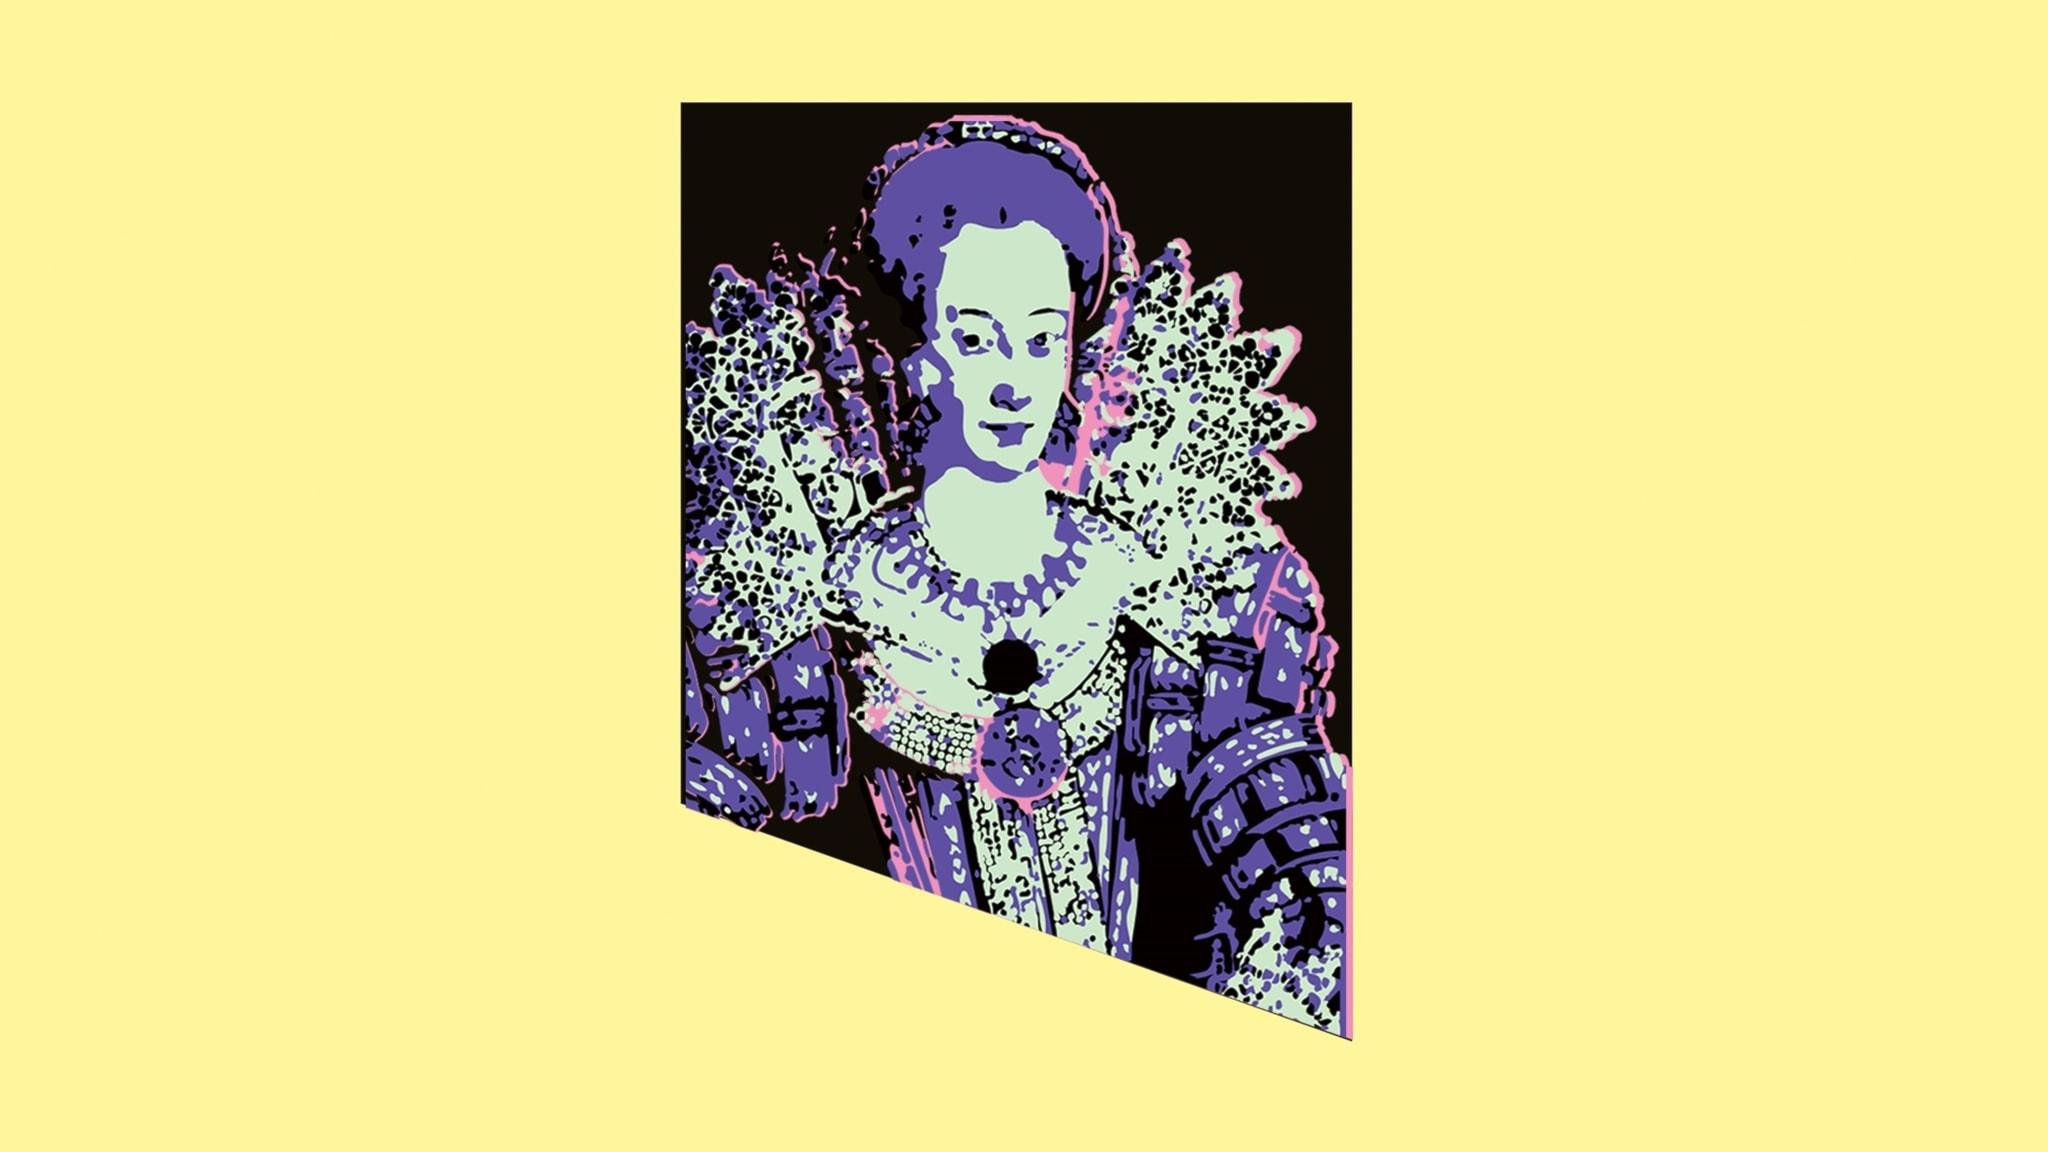 Cecilia Vasa – Sveriges mesta skandalprinsessa